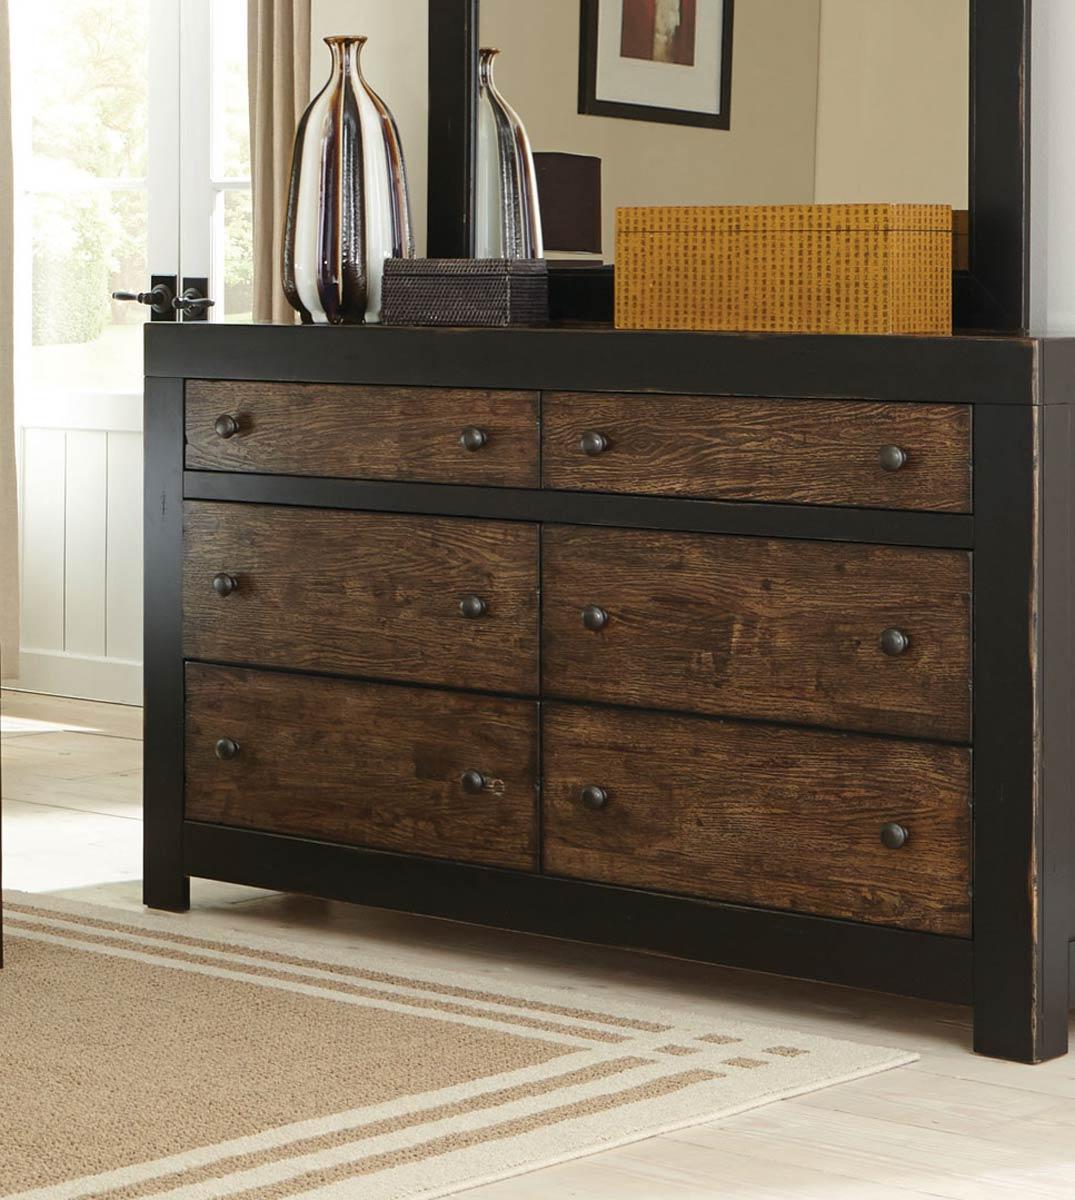 Coaster Segundo Dresser - Antique Oak Embossed/Sand-through Black